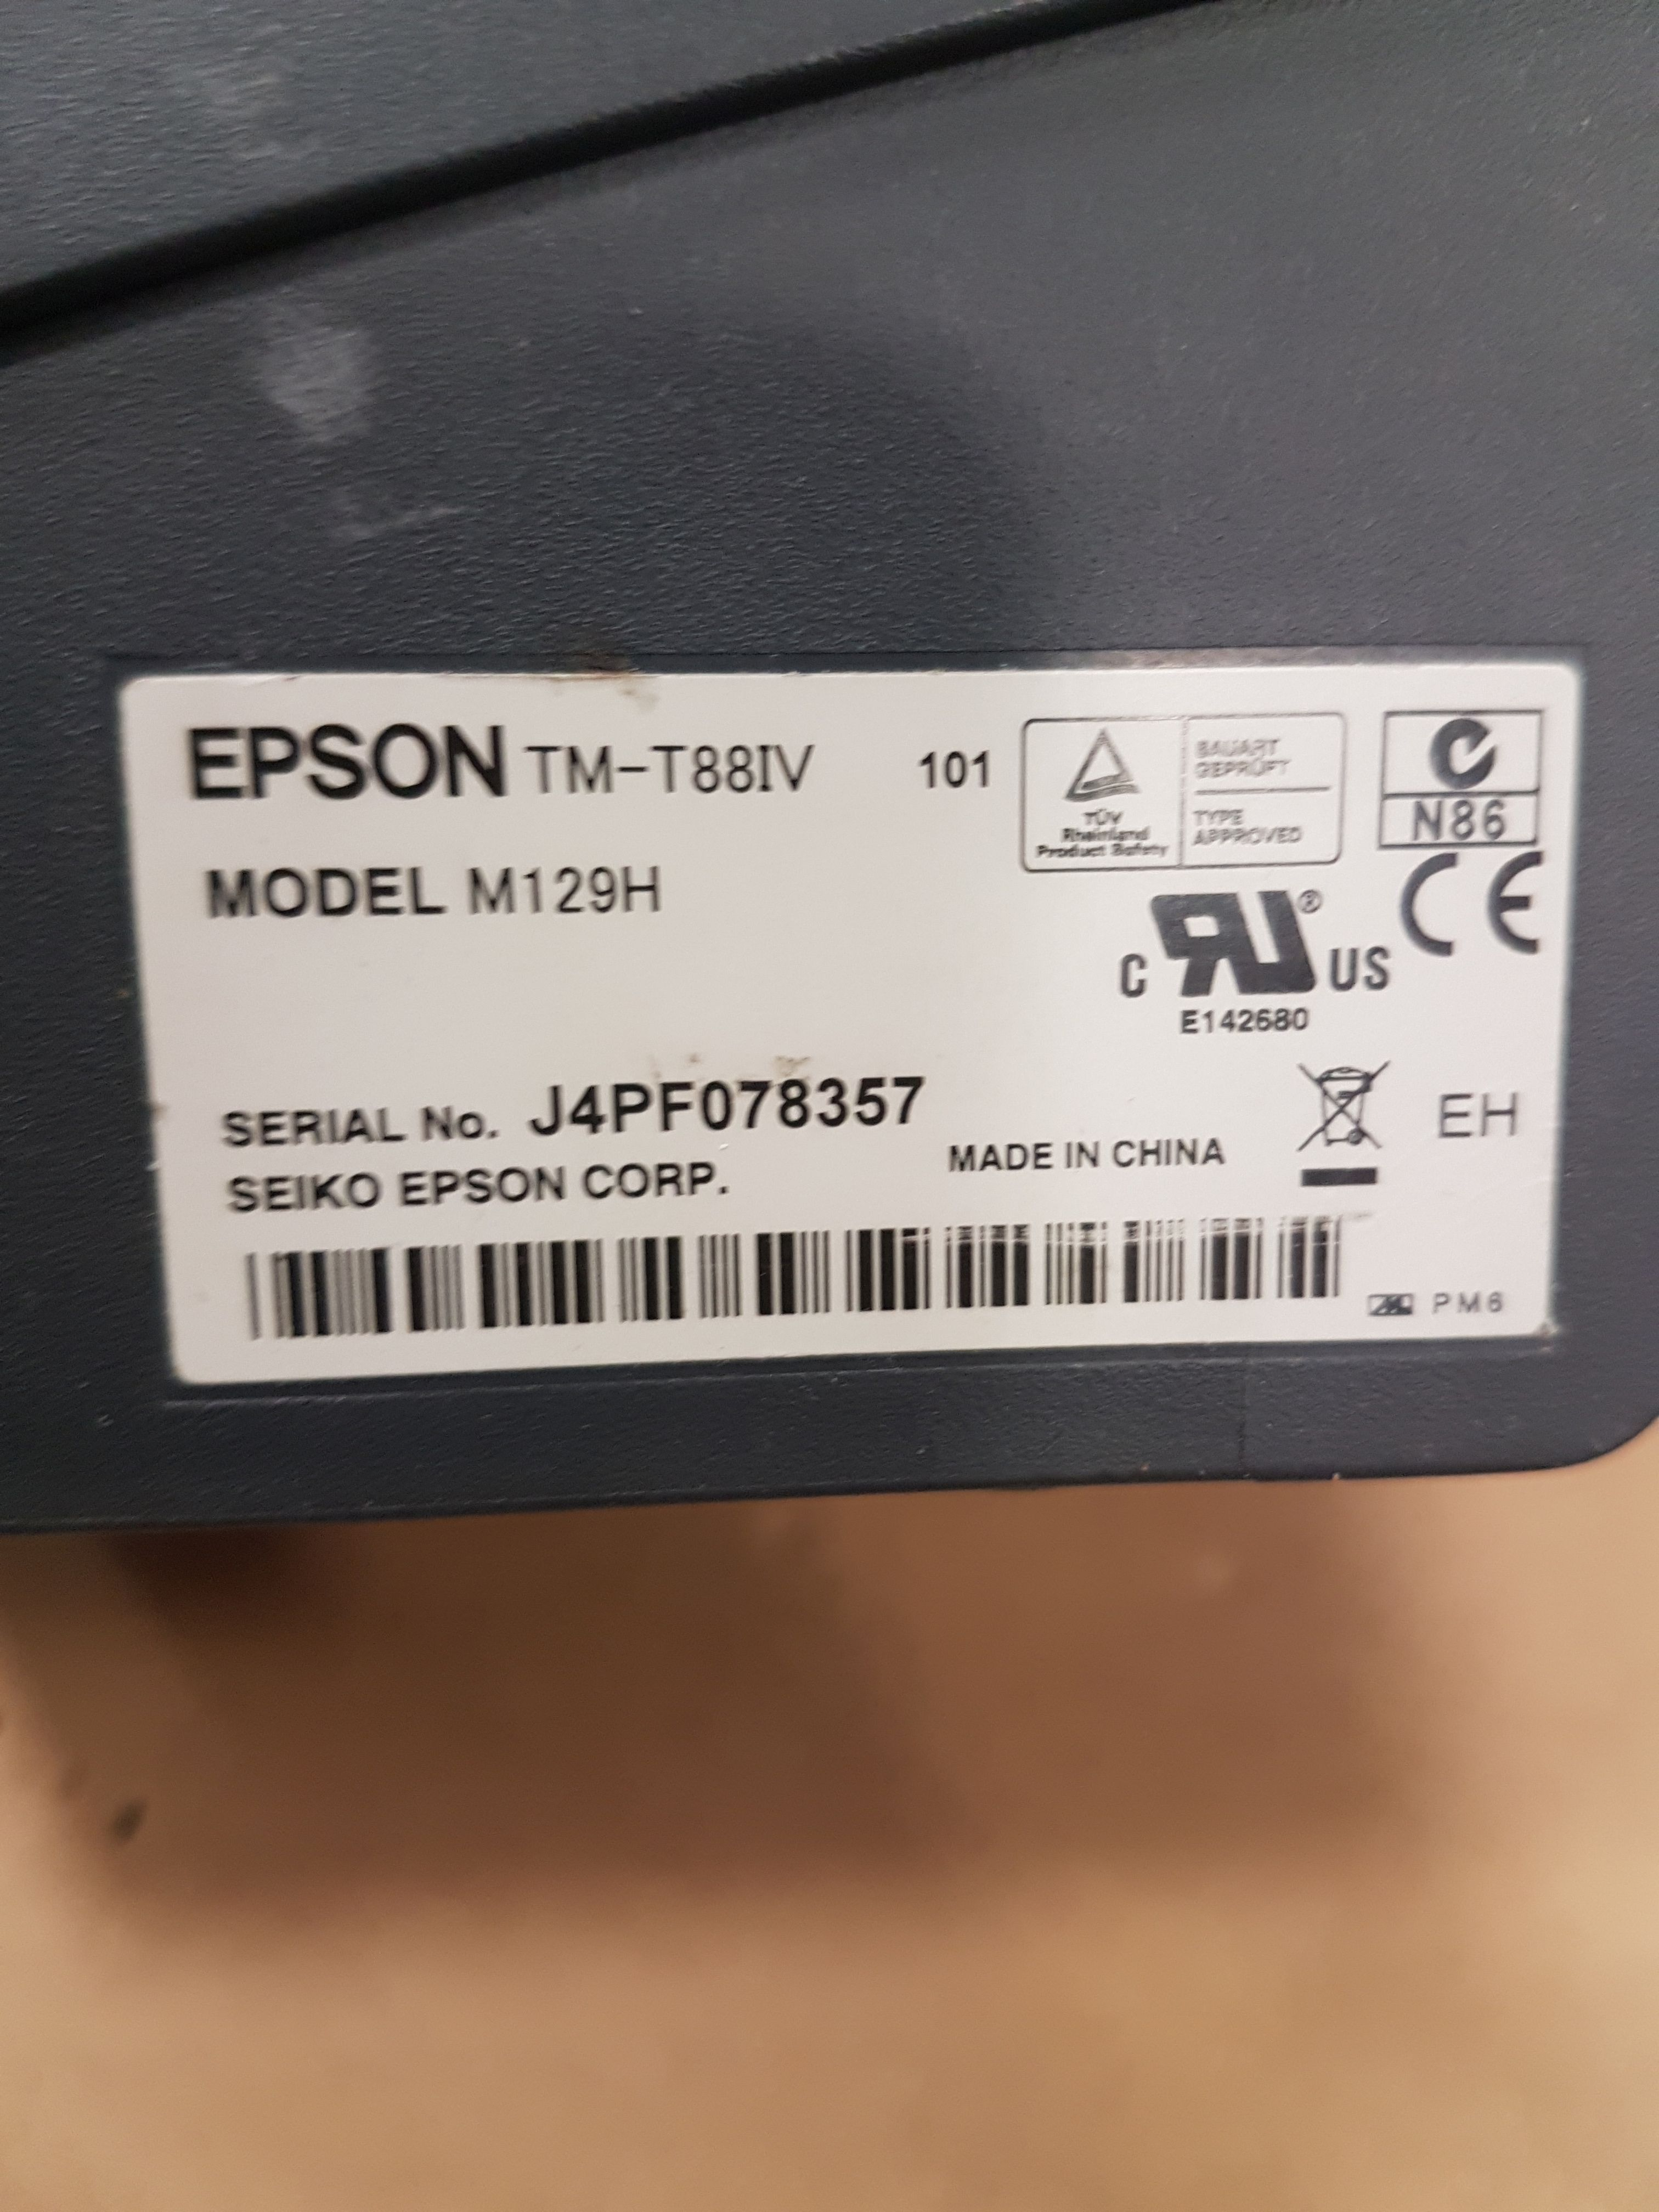 Lot 51 - Epson Thermal Printer - Model M129H